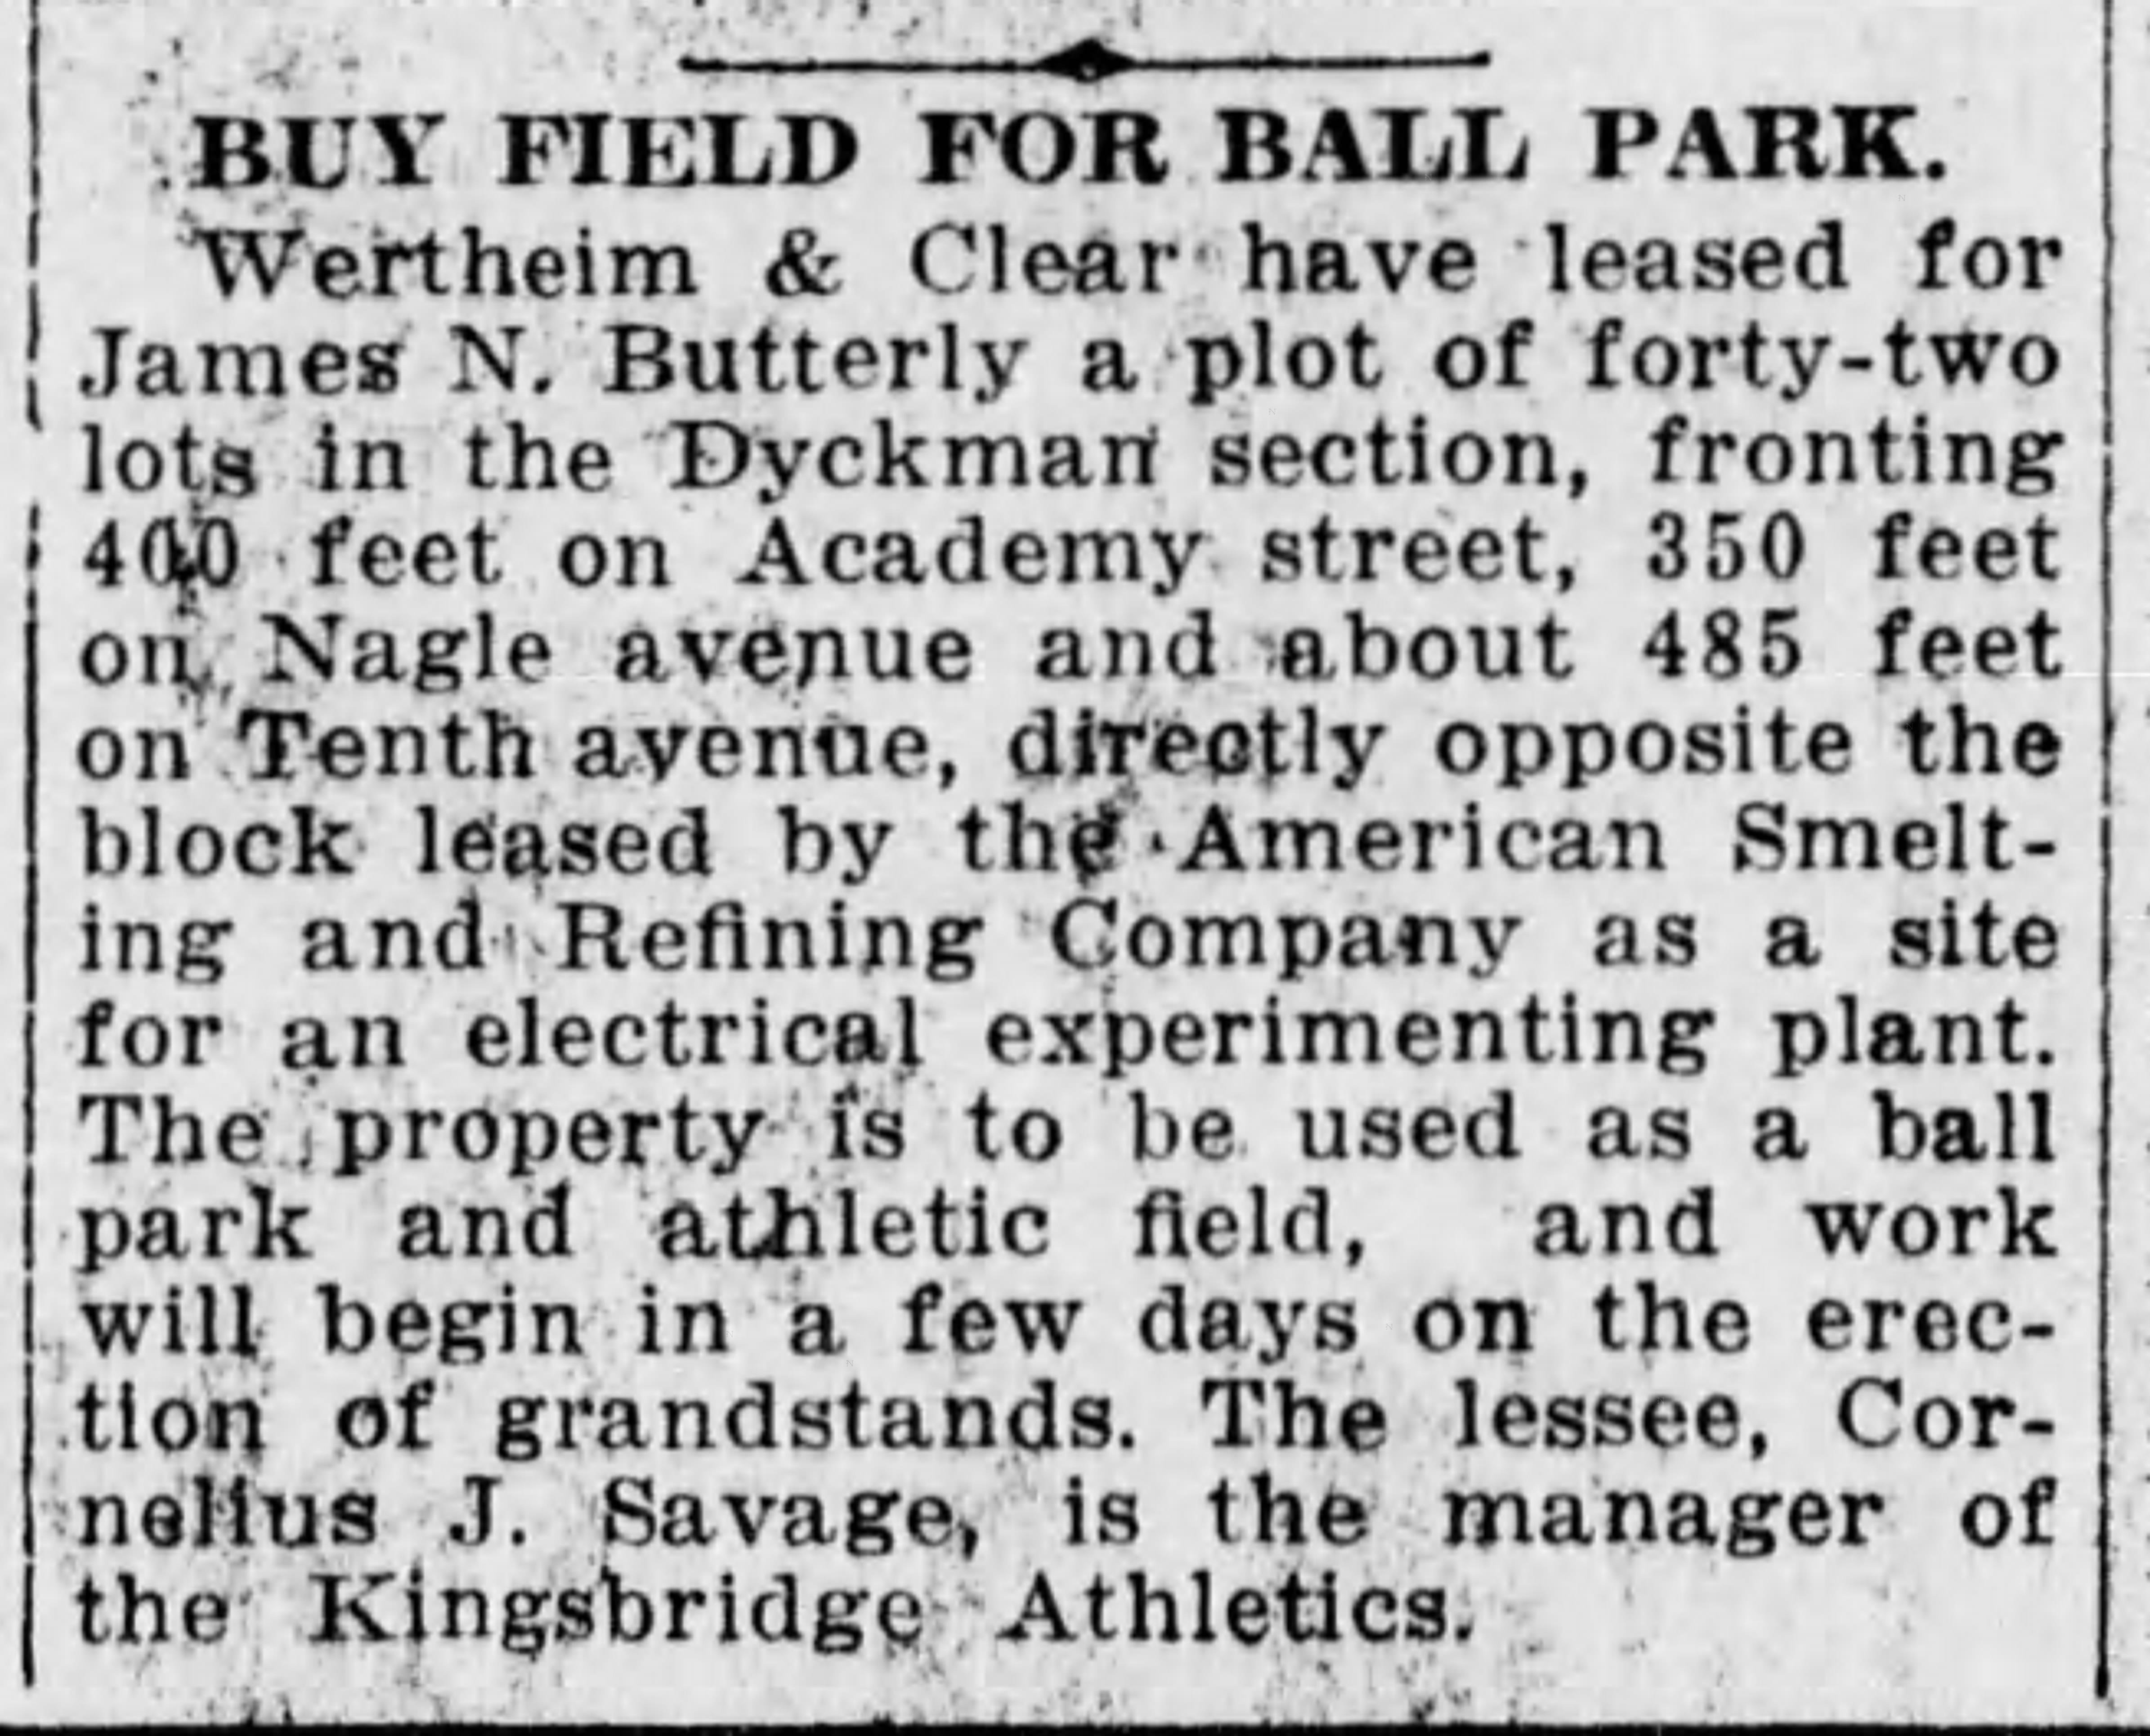 Kingsbridge Athletics sign lease for Dyckman Oval 1917